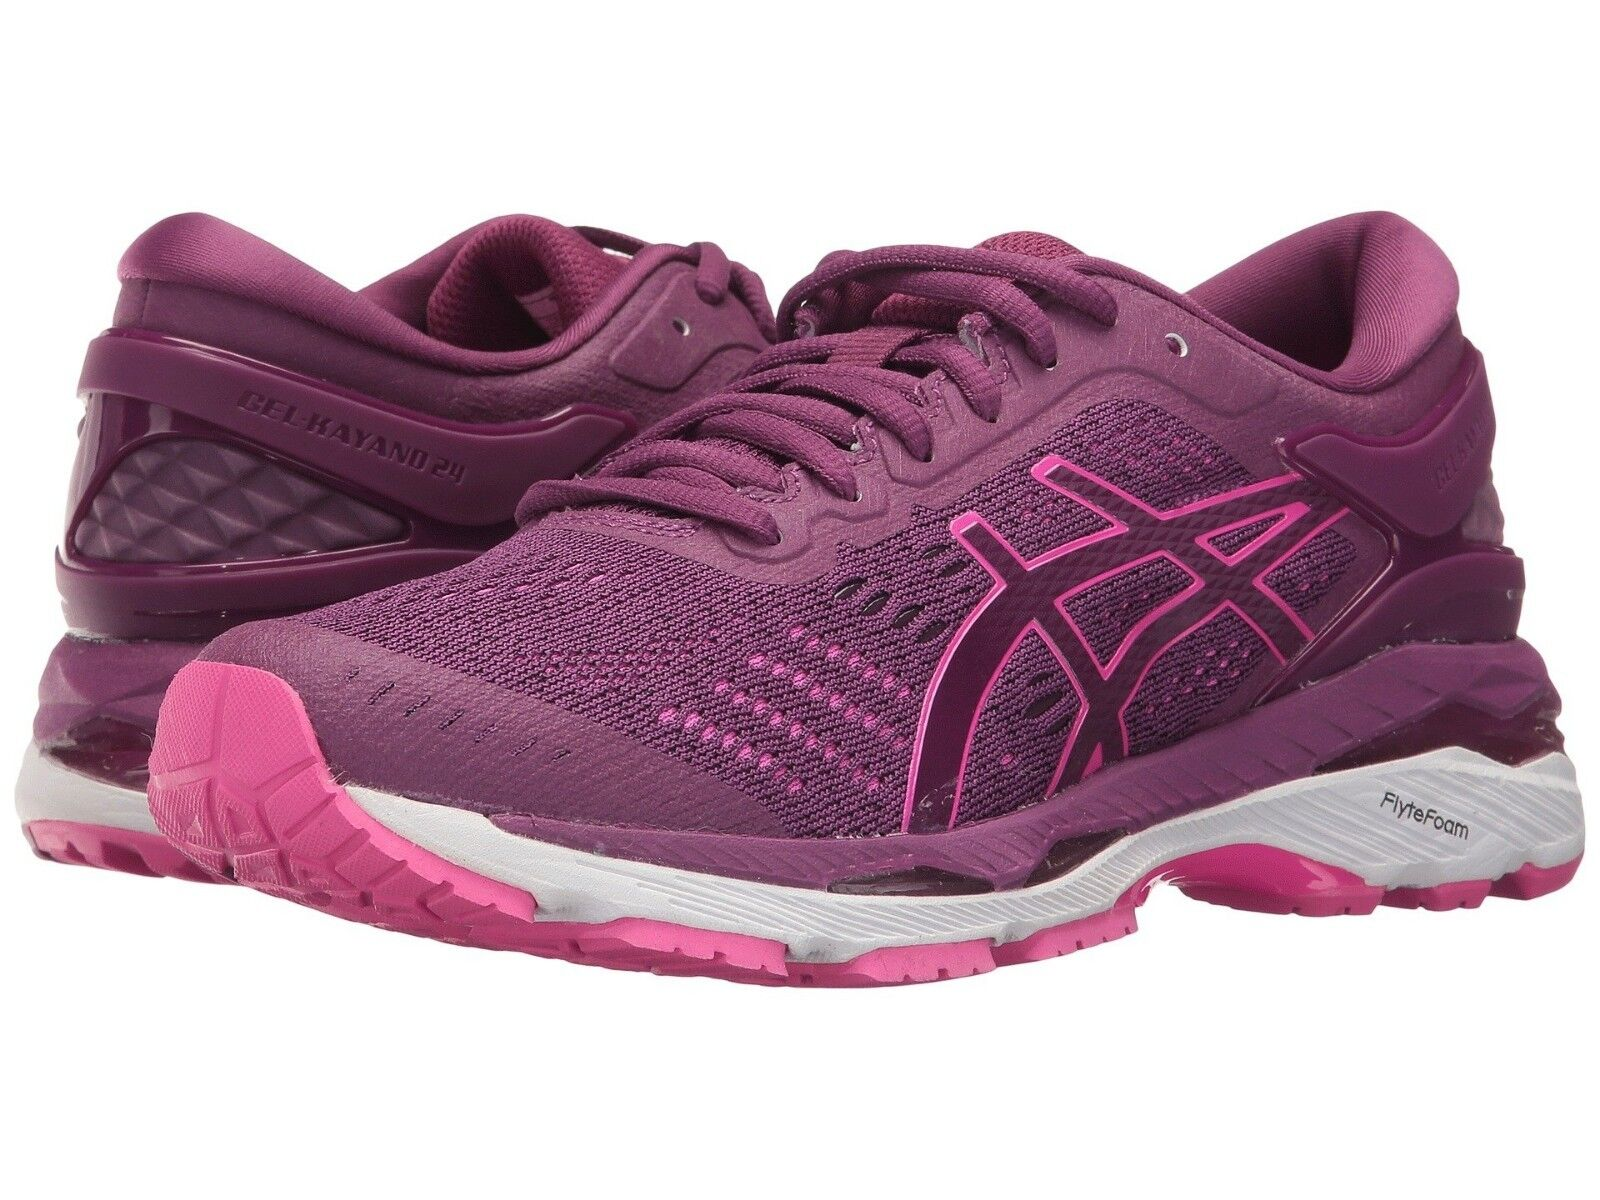 Asics Gel Kayano 24 Para Mujer Zapatos Para Correr (Talla (Talla (Talla 5.5 - 7) Prune rosado blancoo  varios tamaños